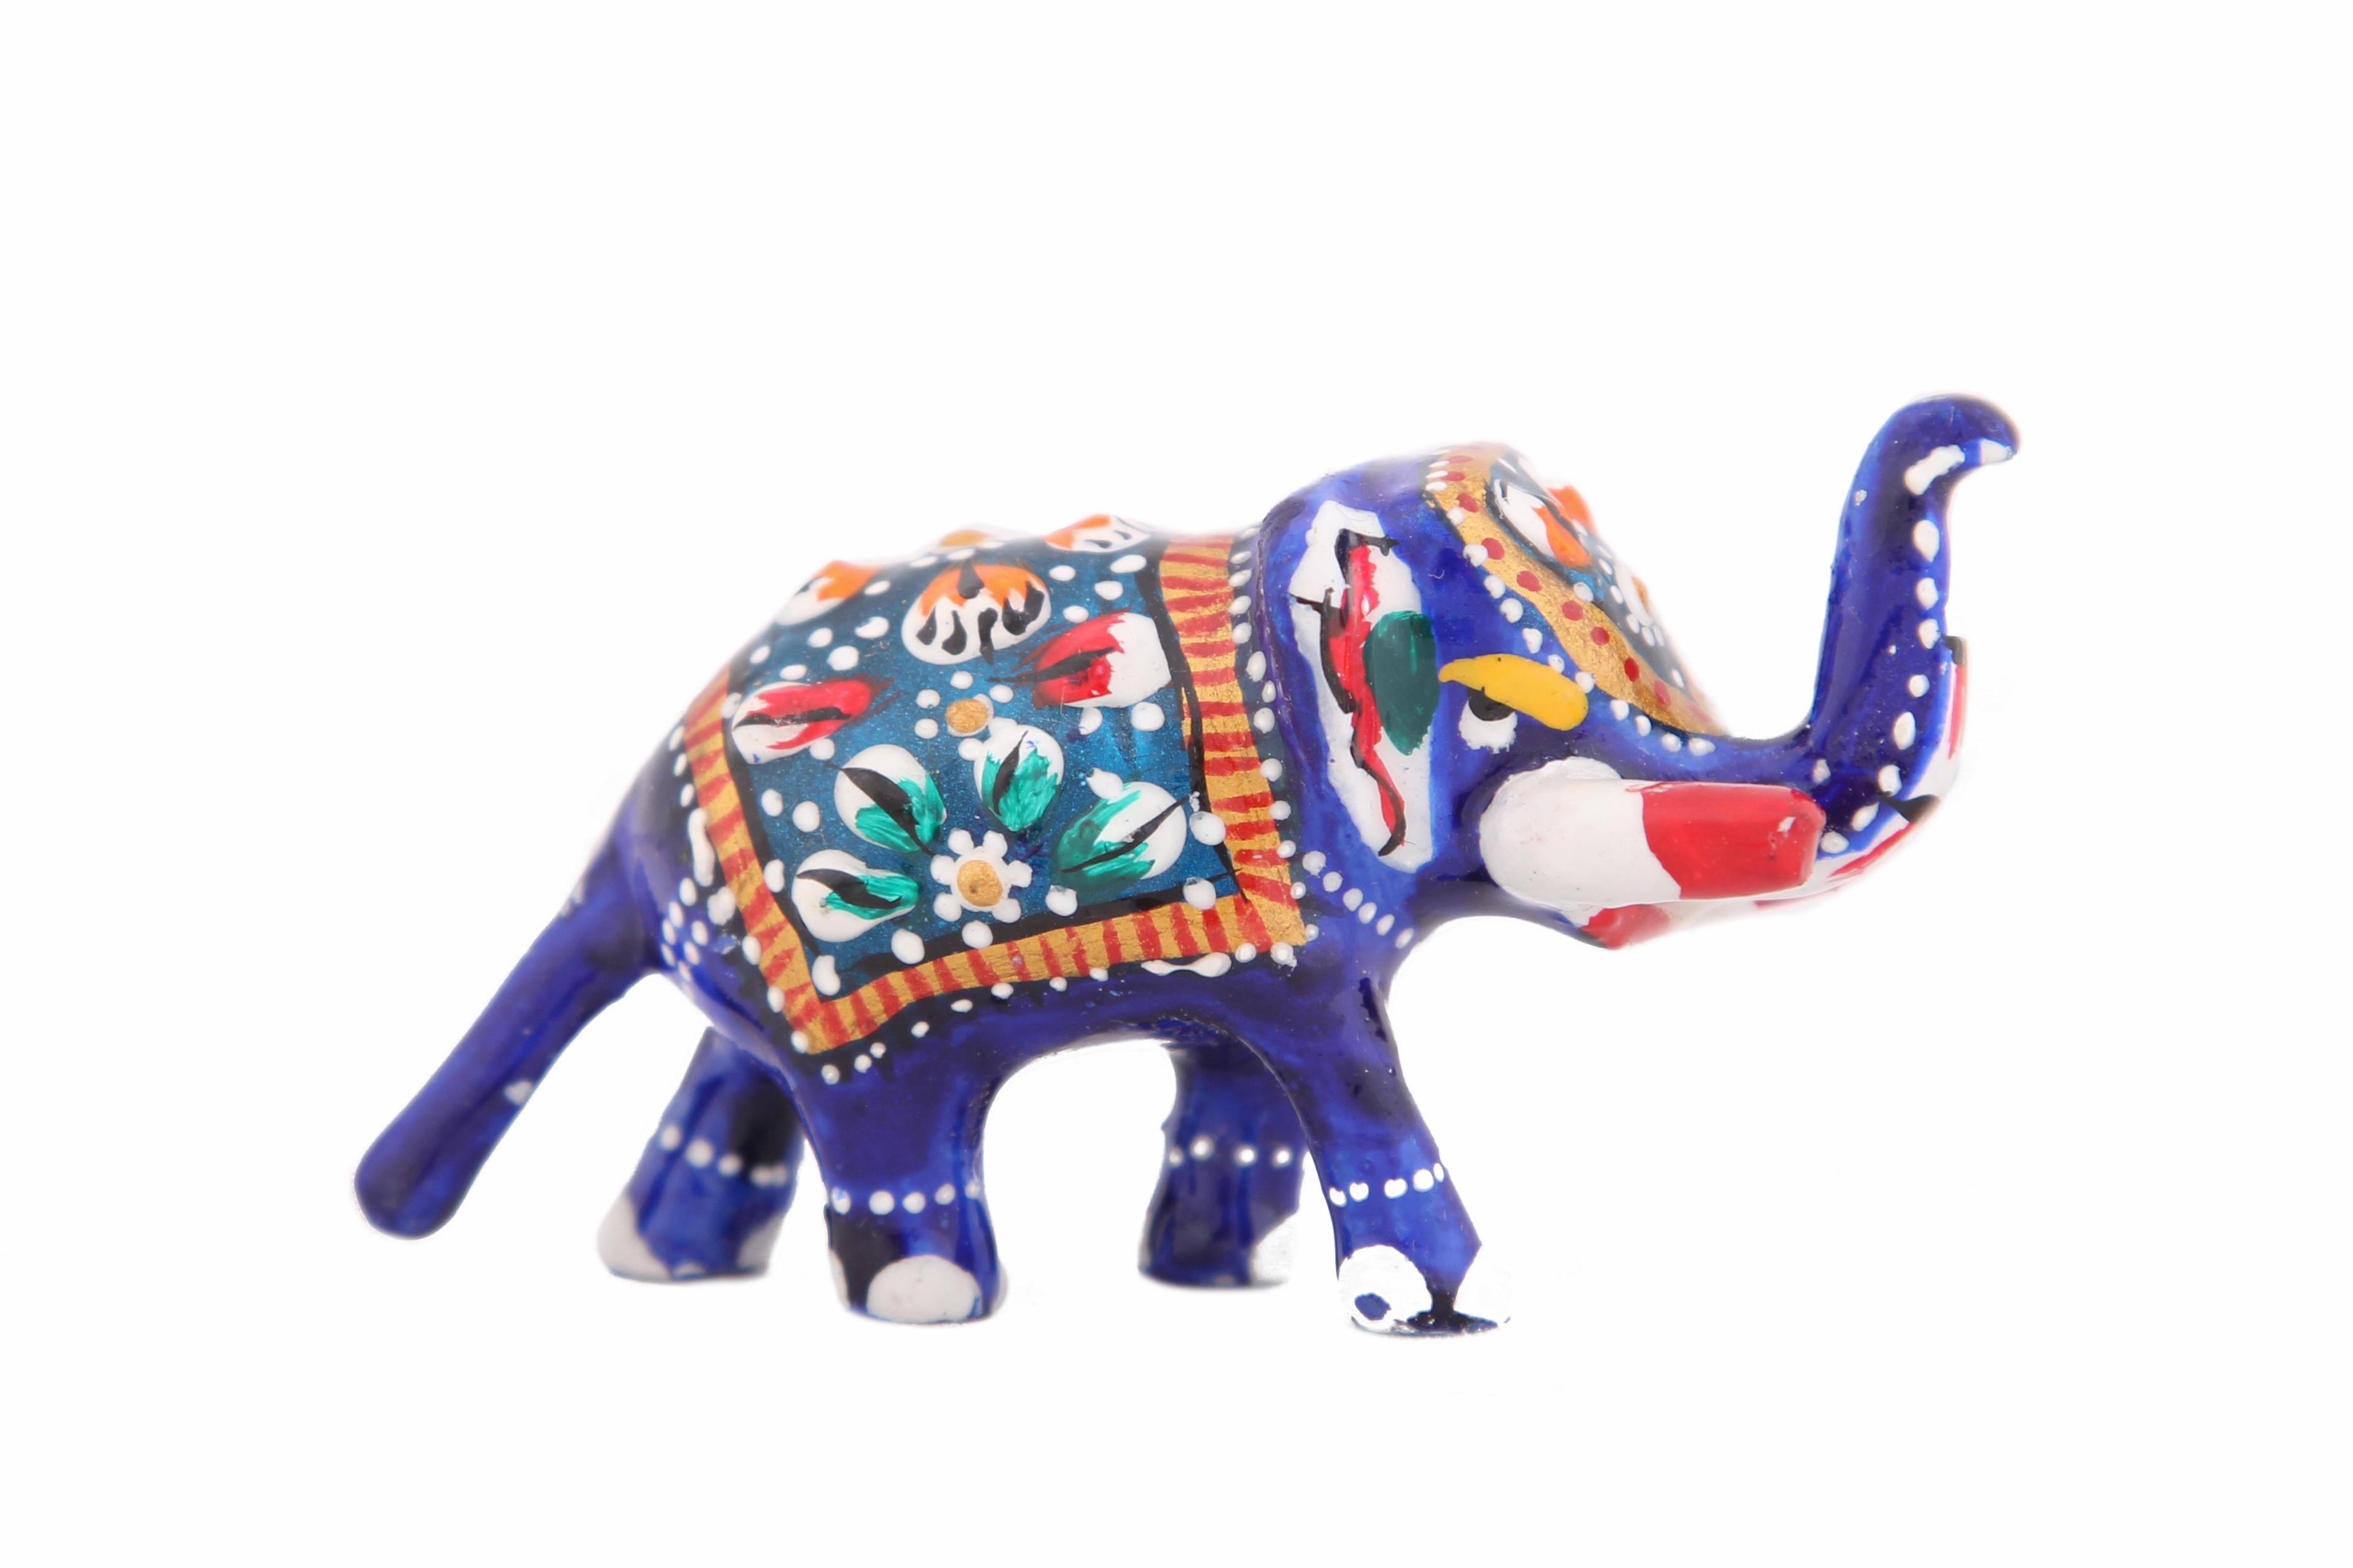 {} Ганг Статуэтка Слон (2х4х5 см) статуэтка африканка федерация статуэтка африканка